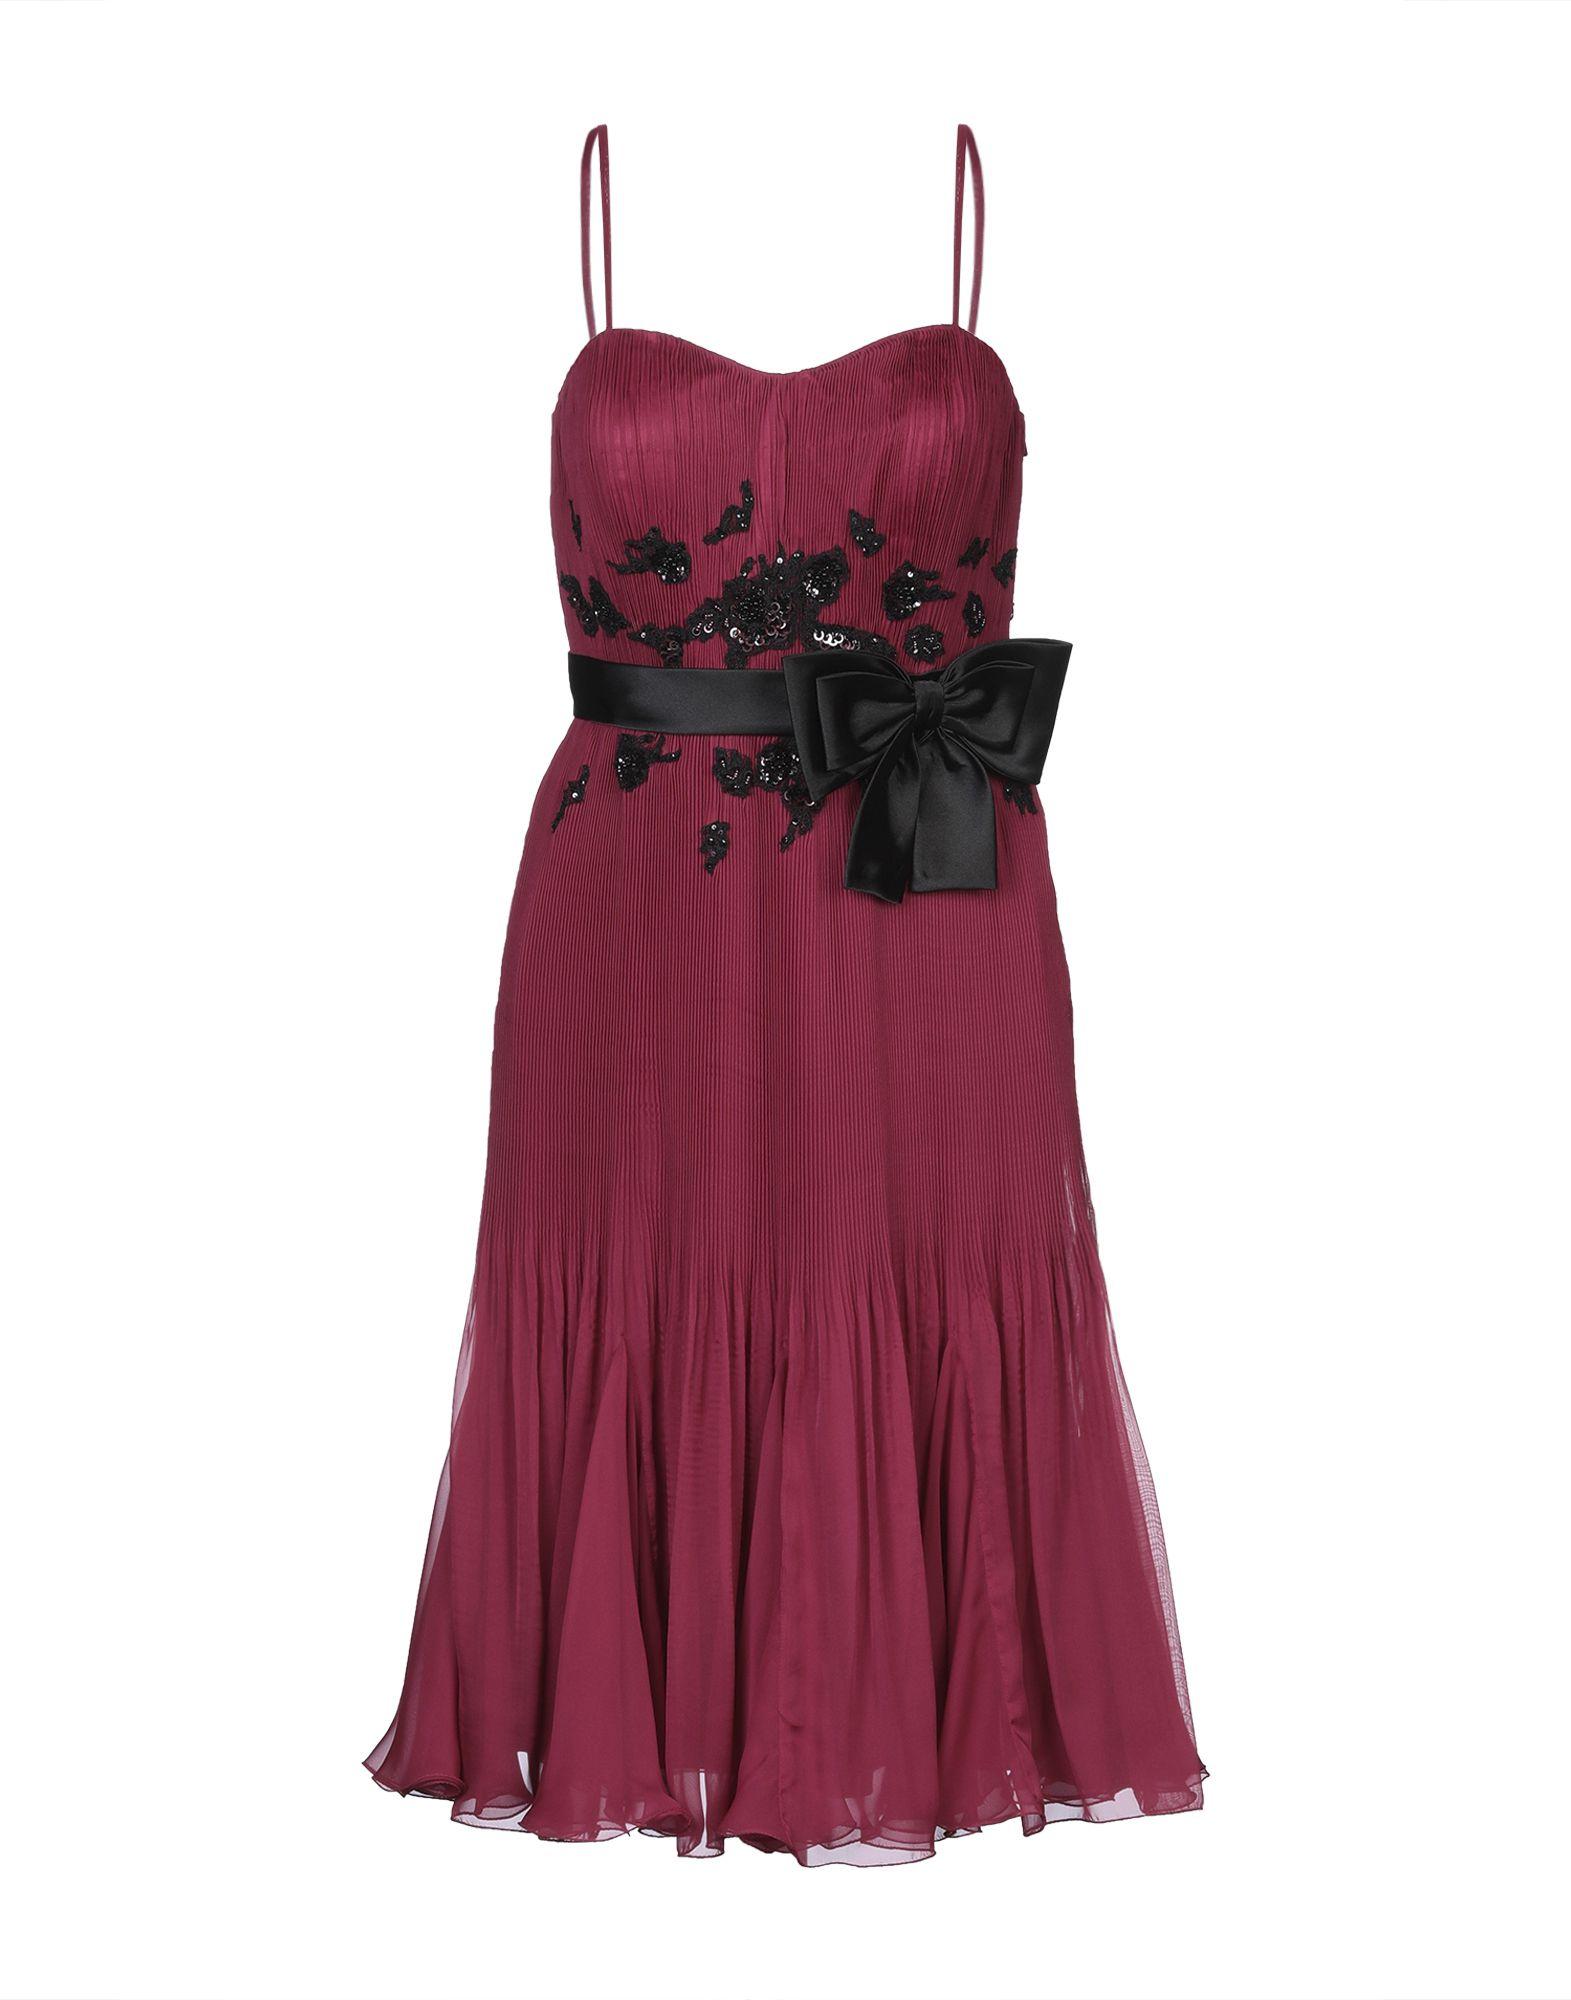 pastore couture палантин PASTORE COUTURE Платье миди